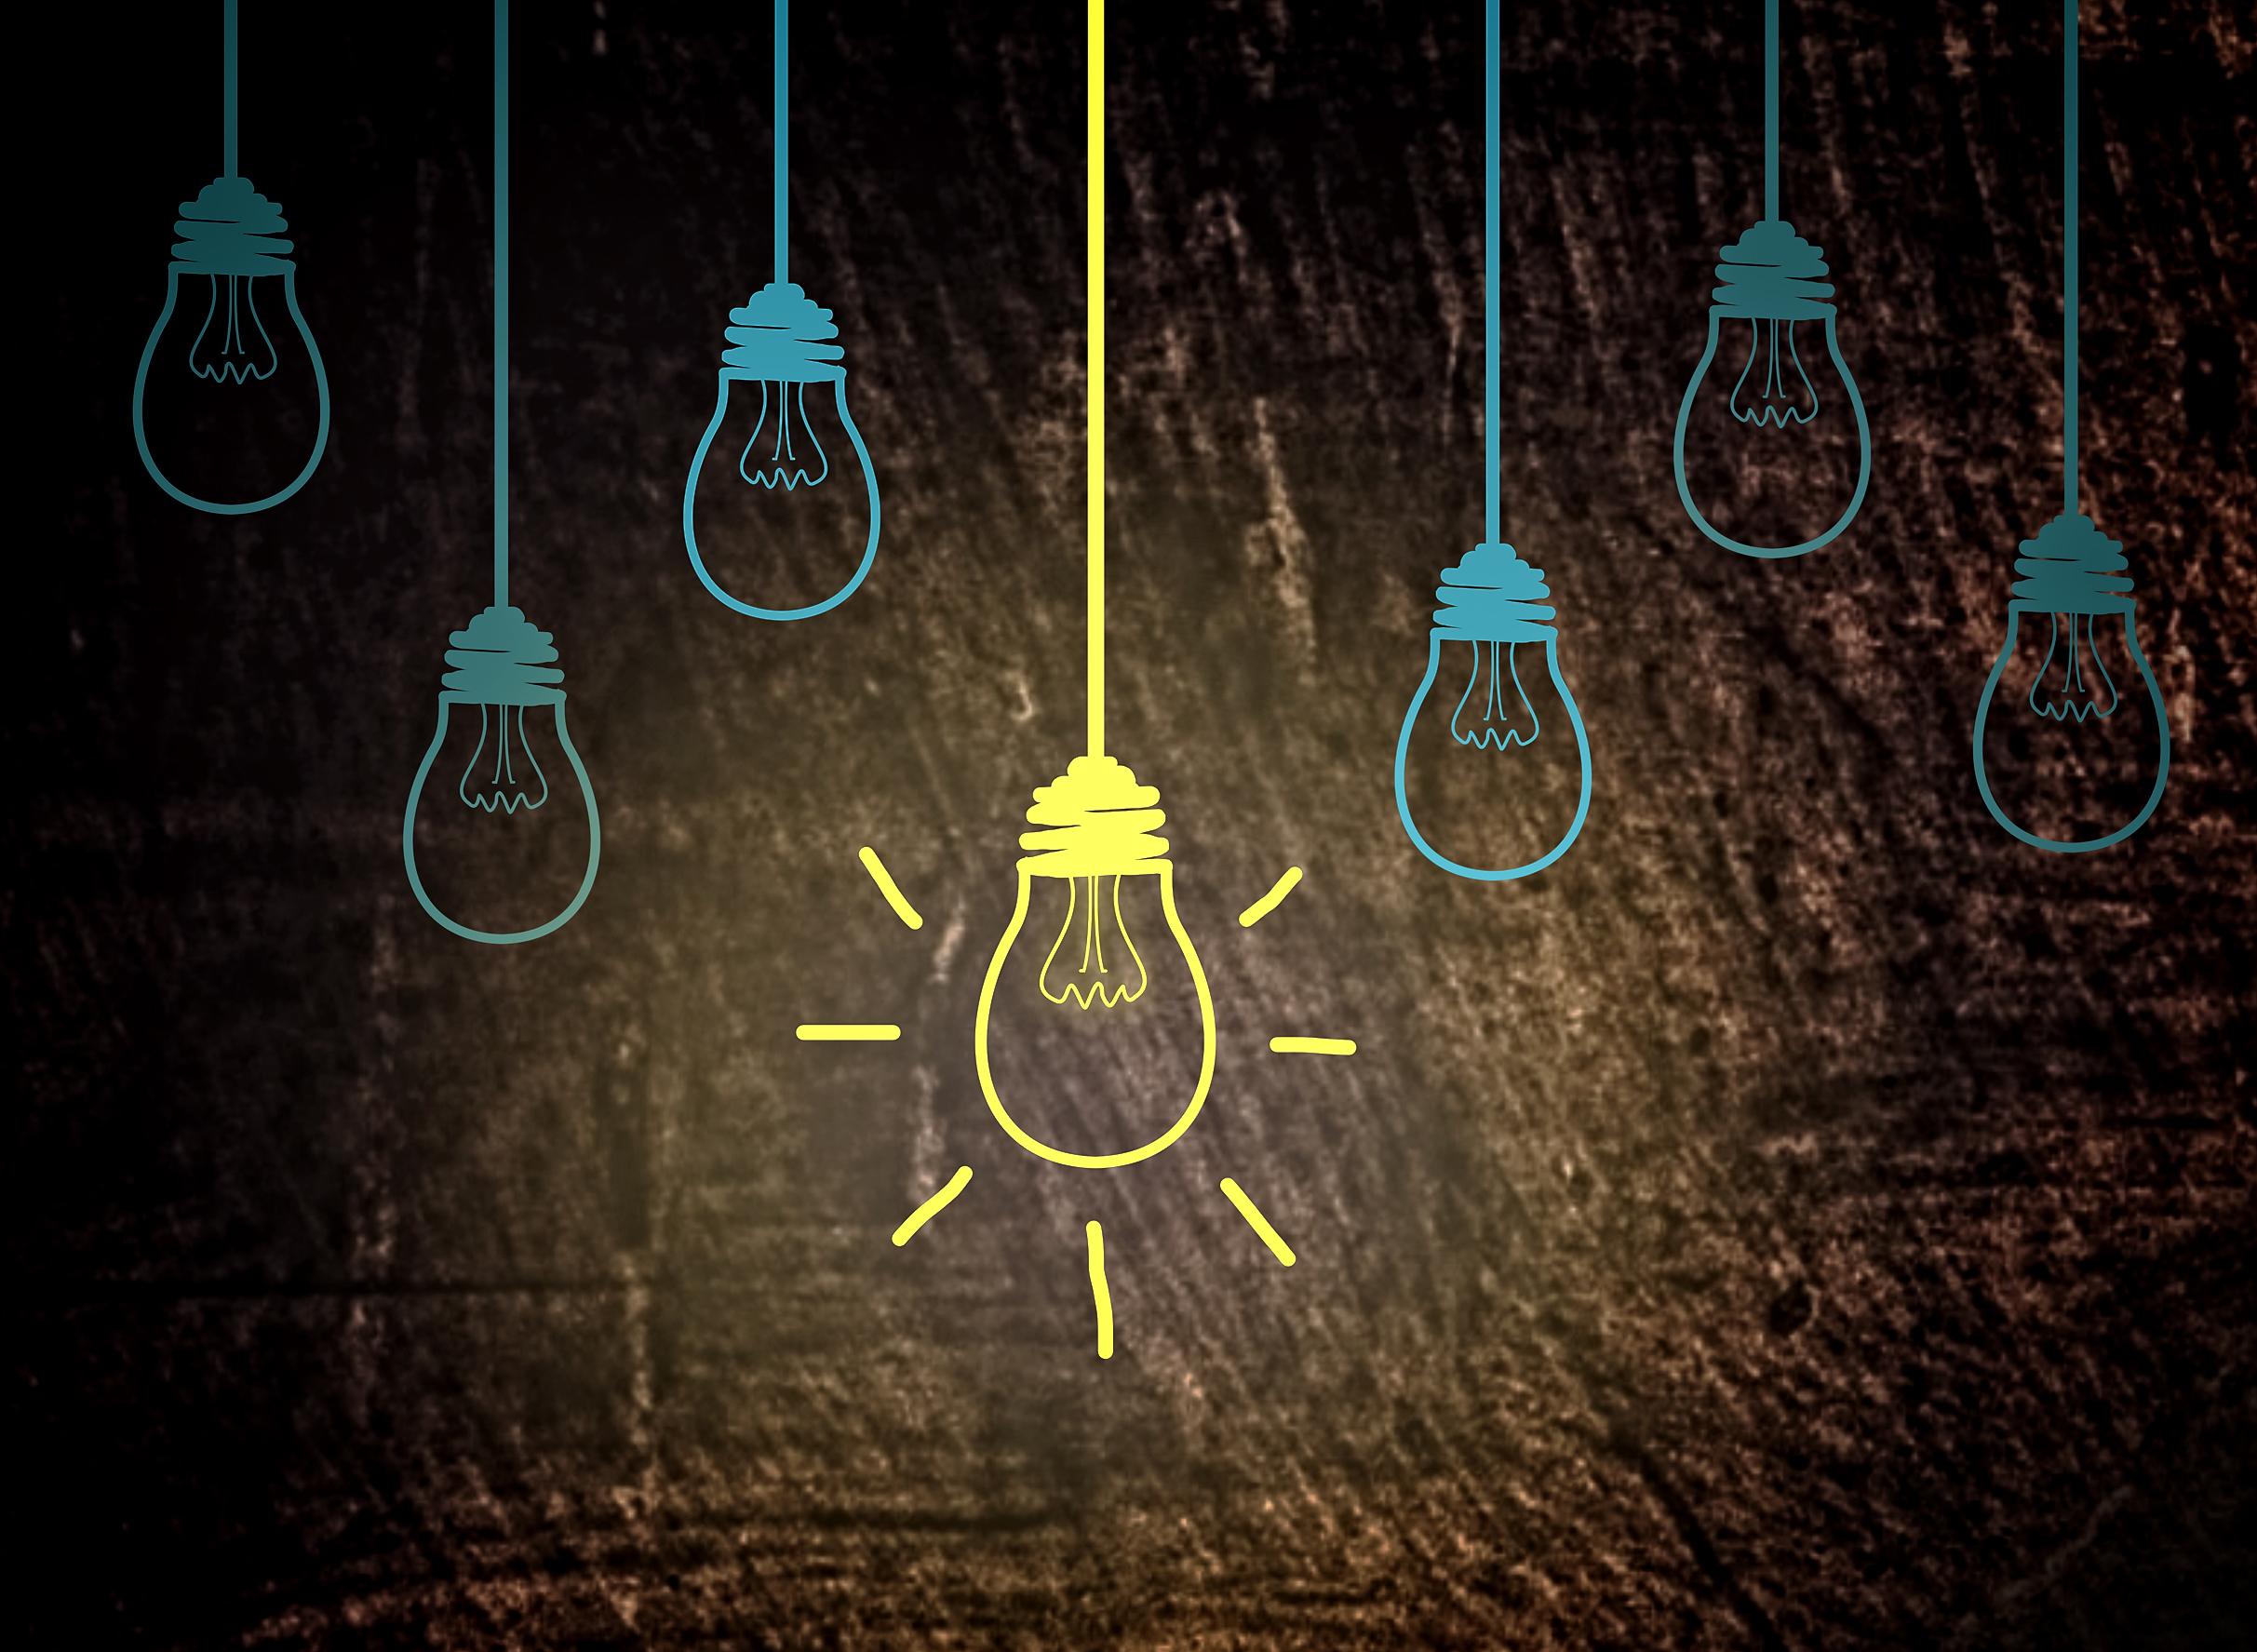 Lightbulbs on wood - creativity concept photo